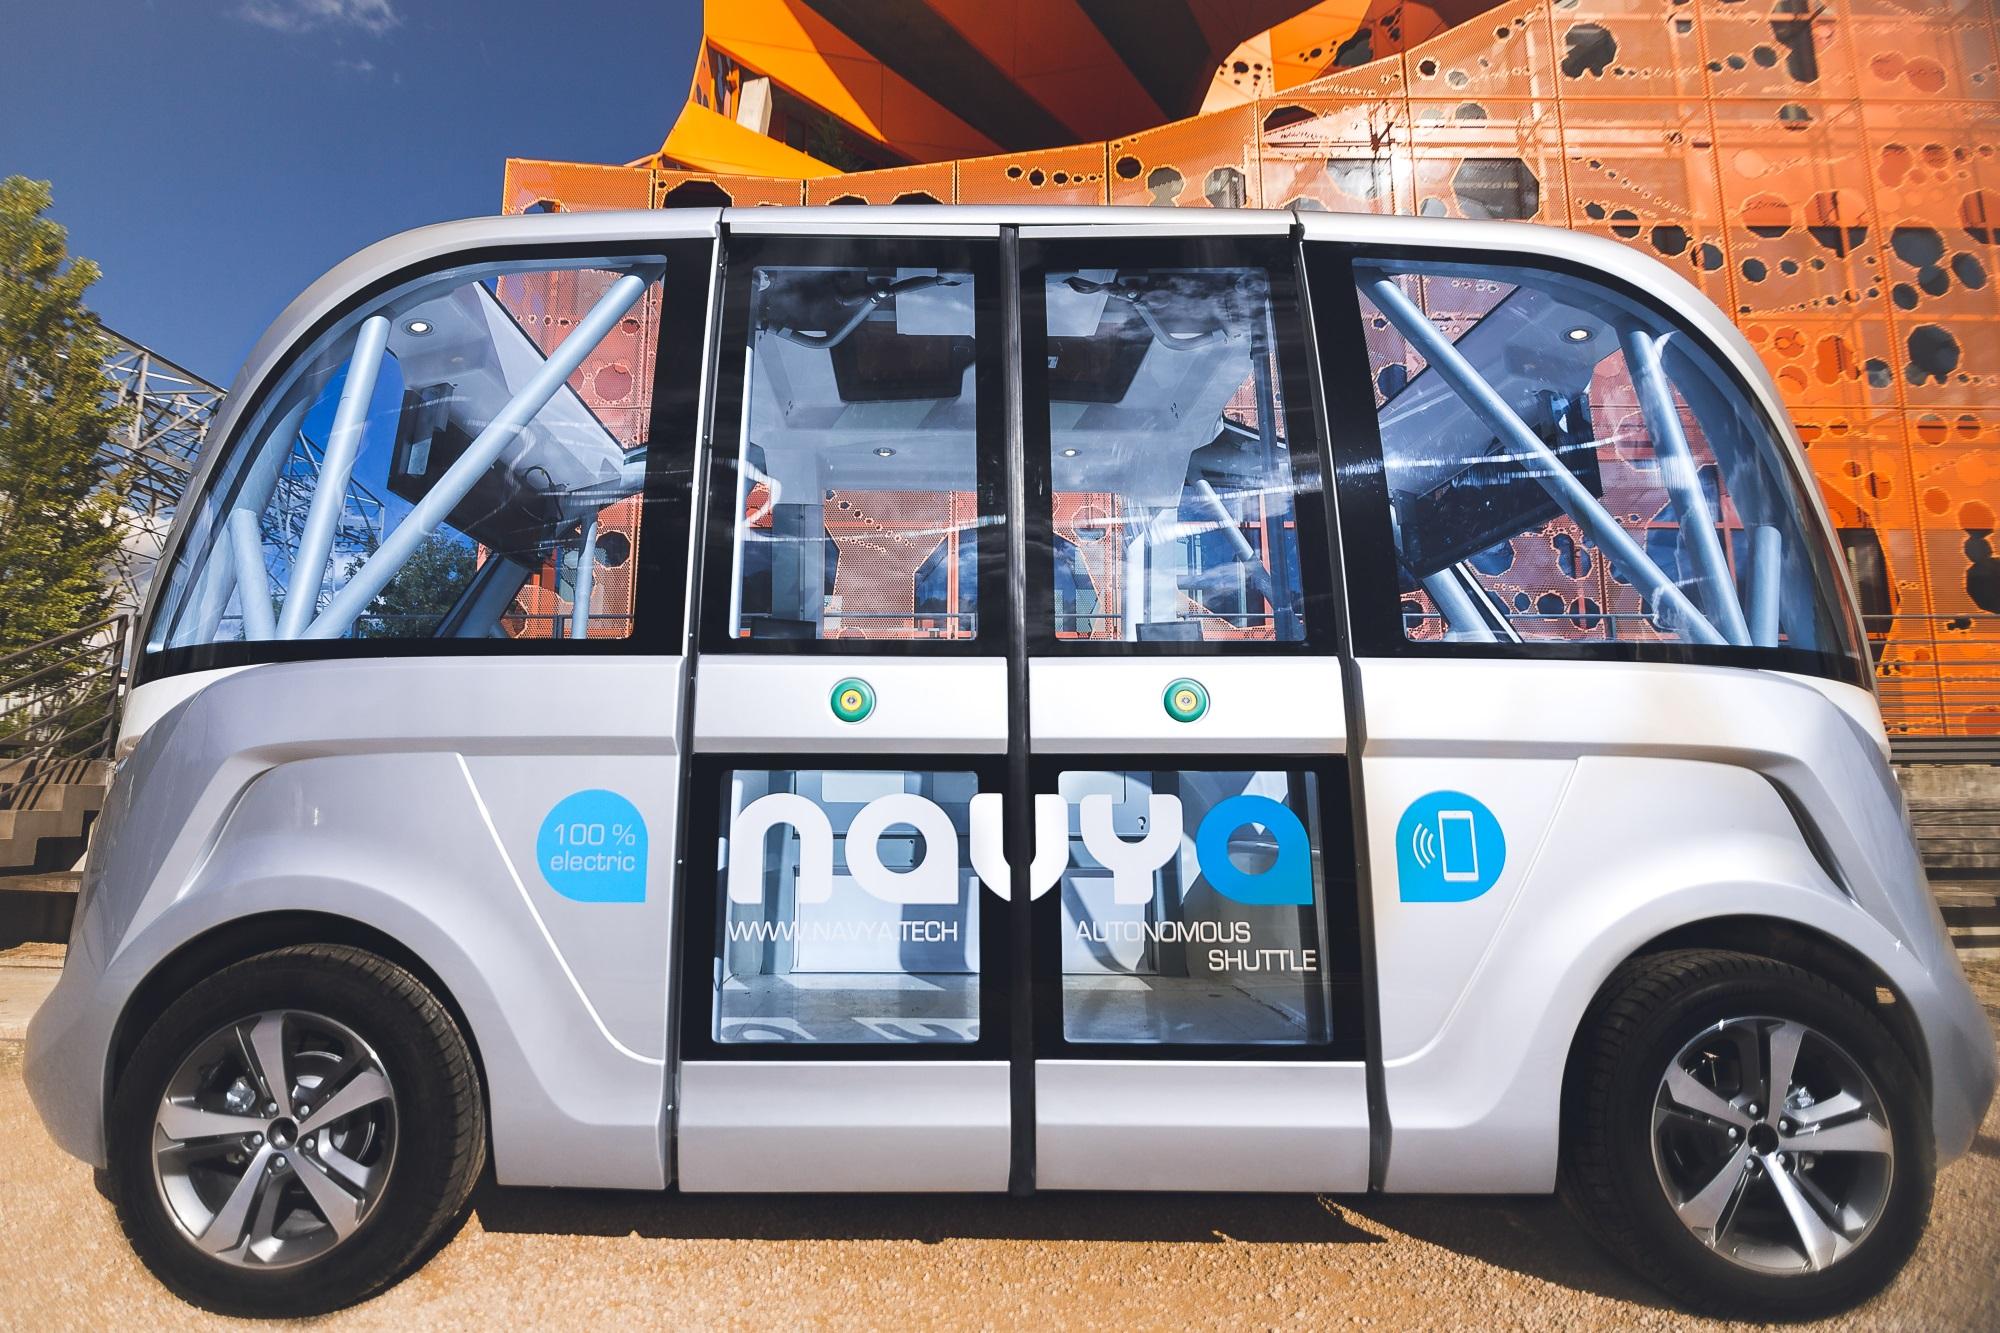 The Arma driverless bus.